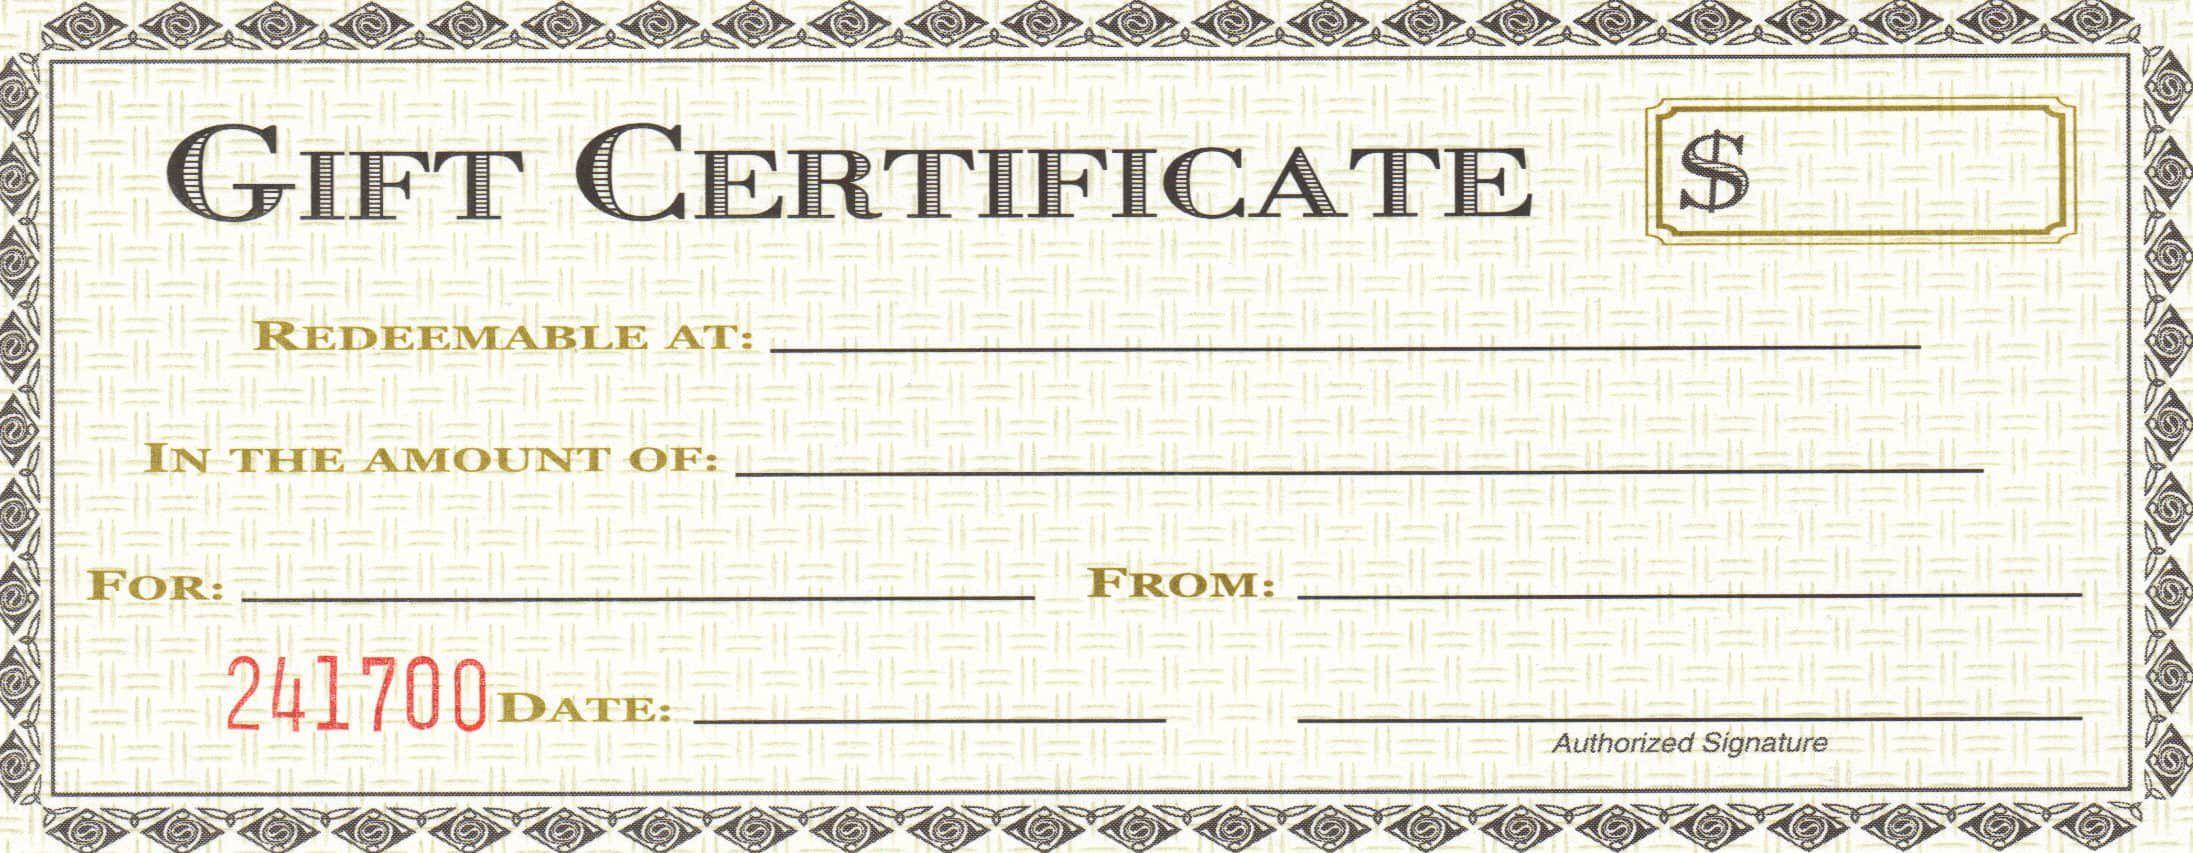 009 Remarkable Restaurant Gift Certificate Template Design  Templates Card Word Voucher FreeFull